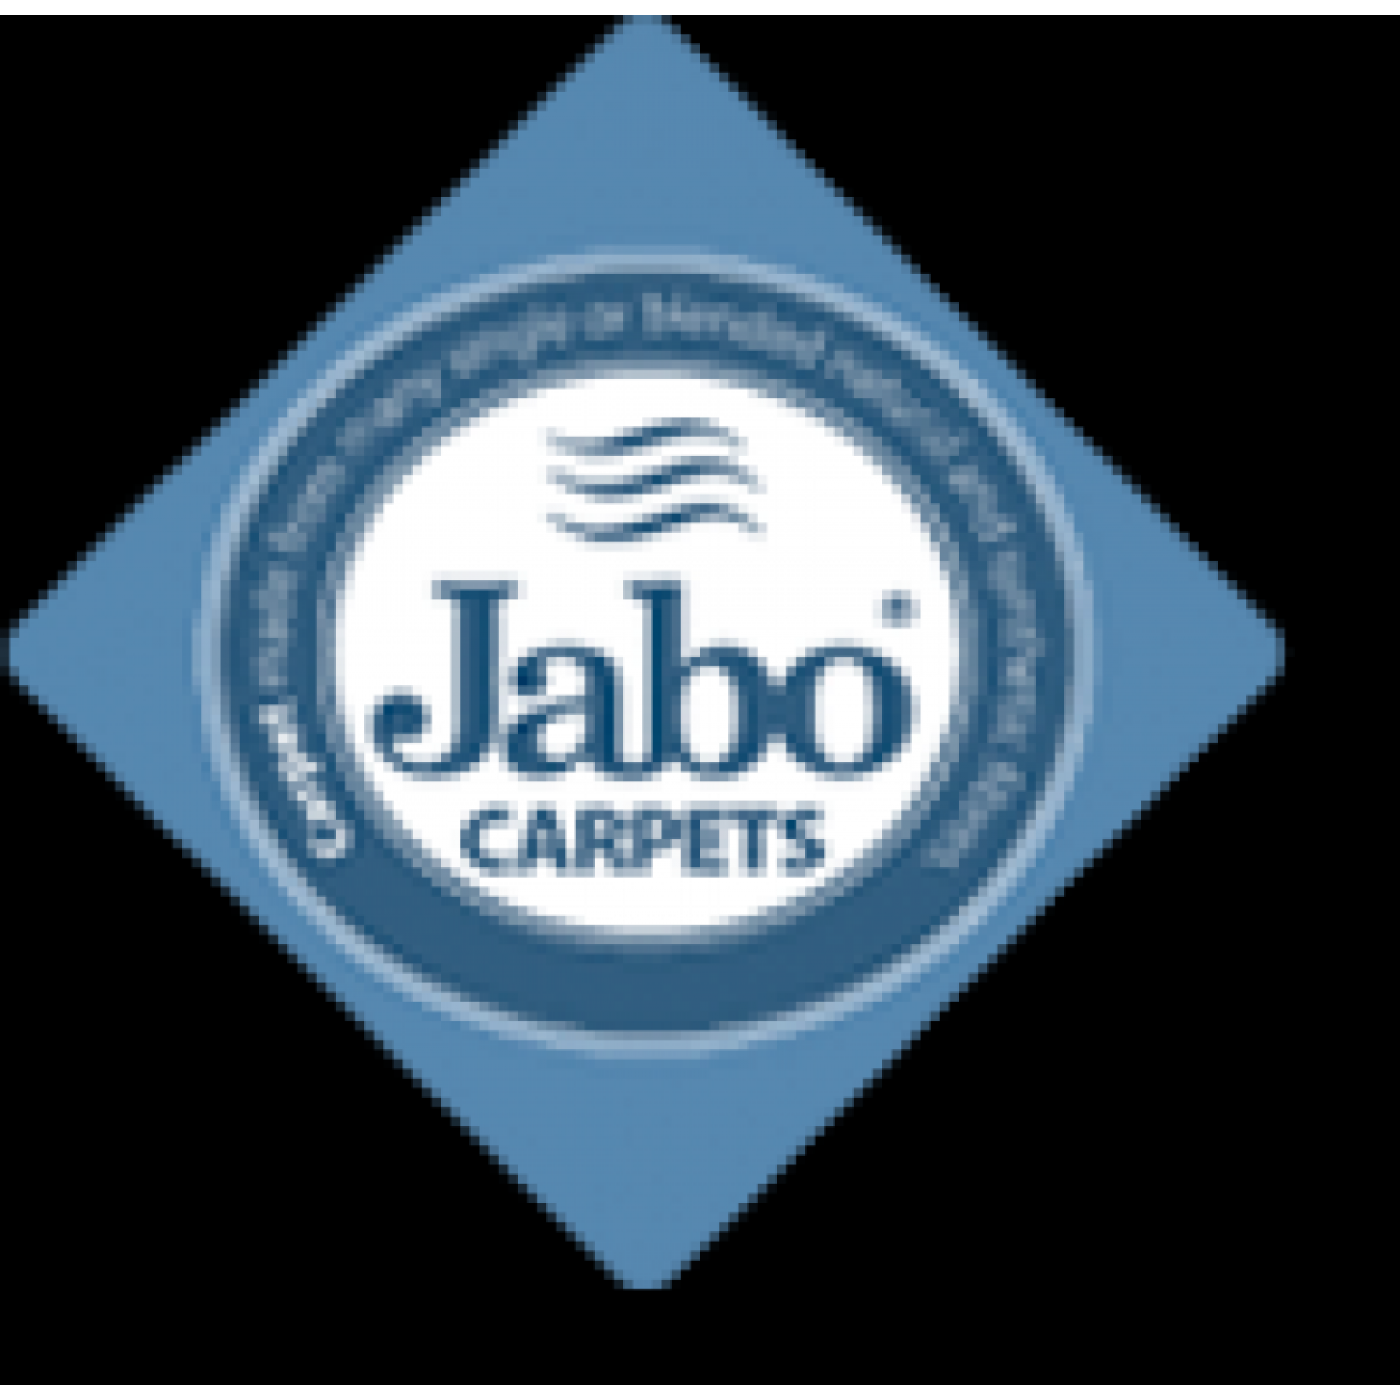 Jabo Carpets